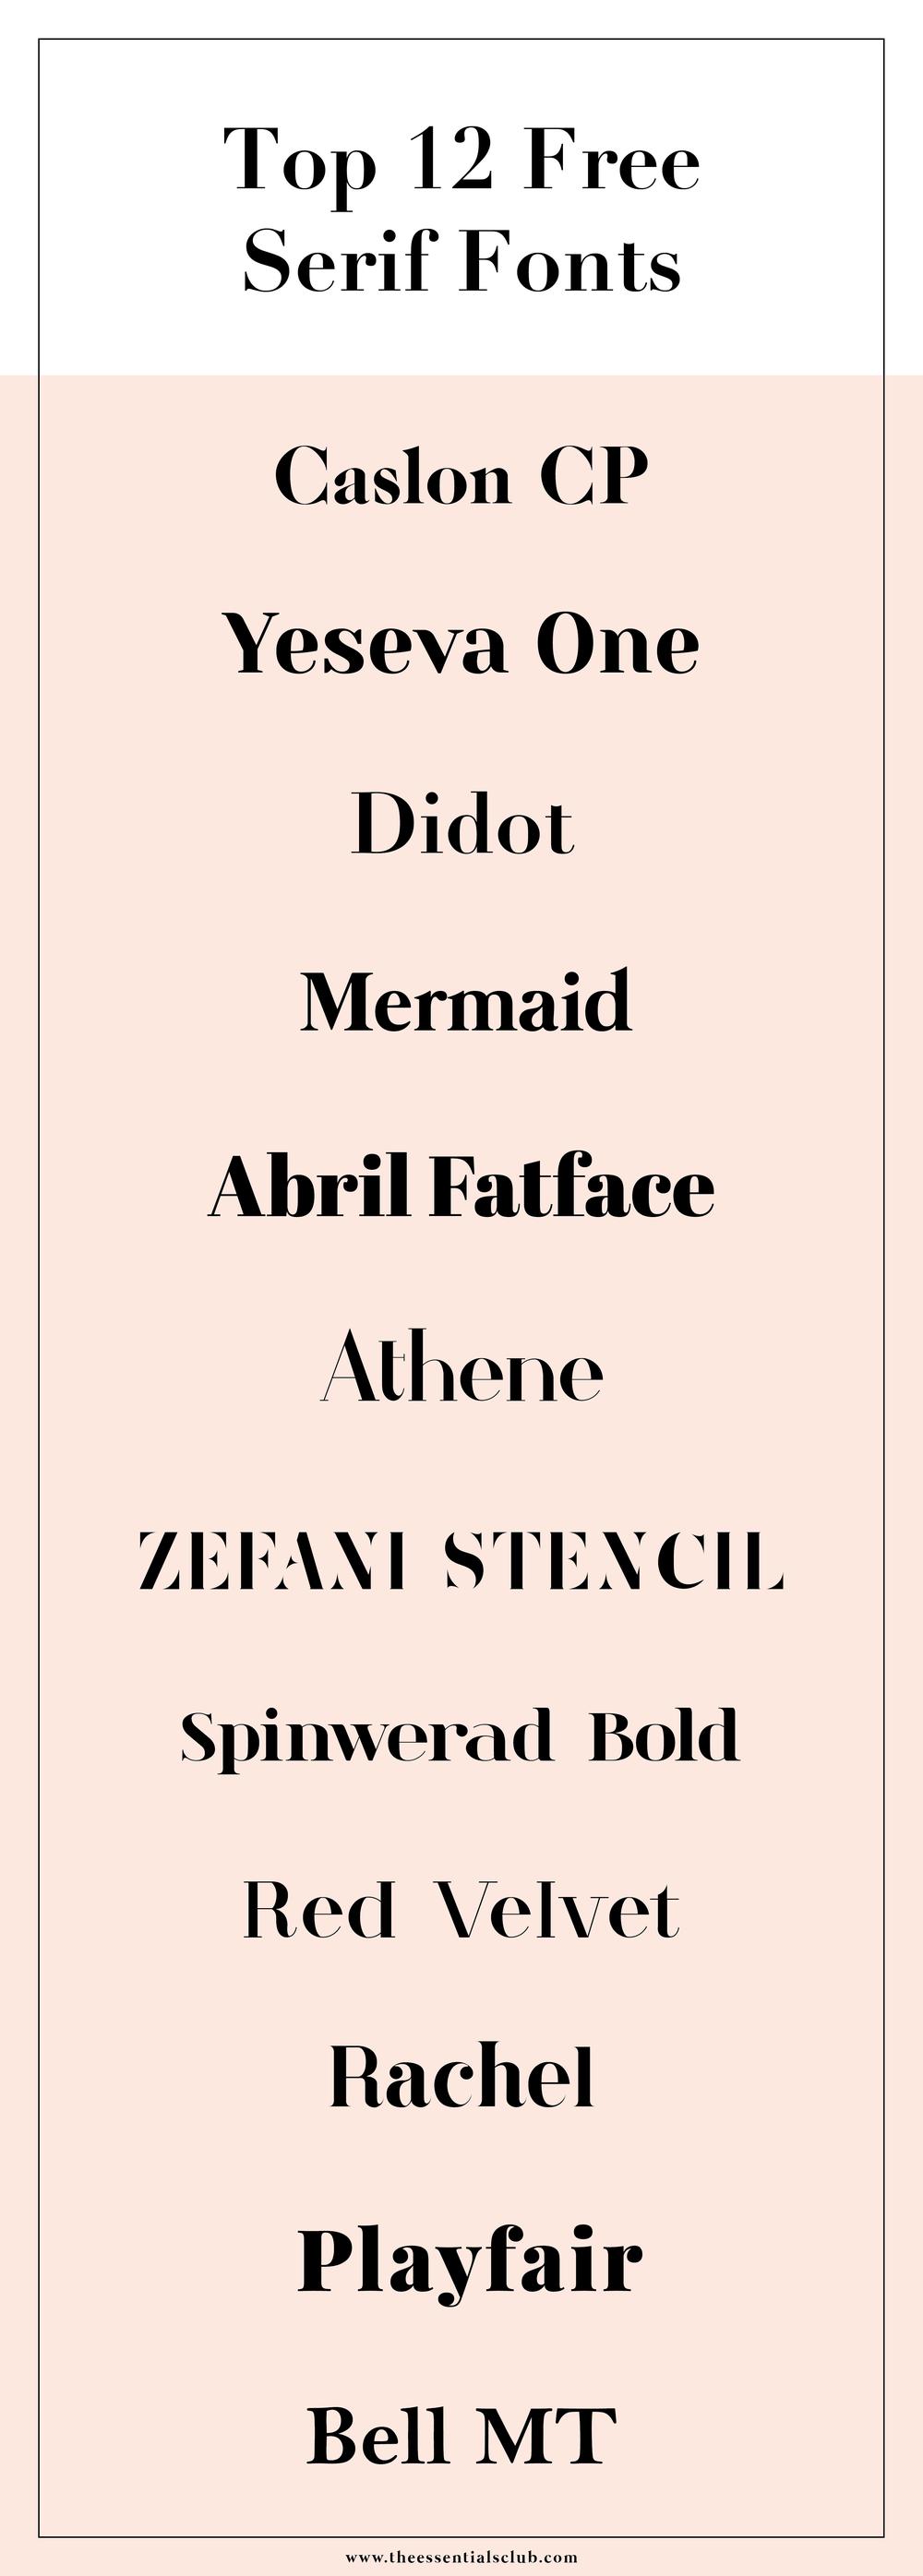 01 Serif Fonts-01-01.png